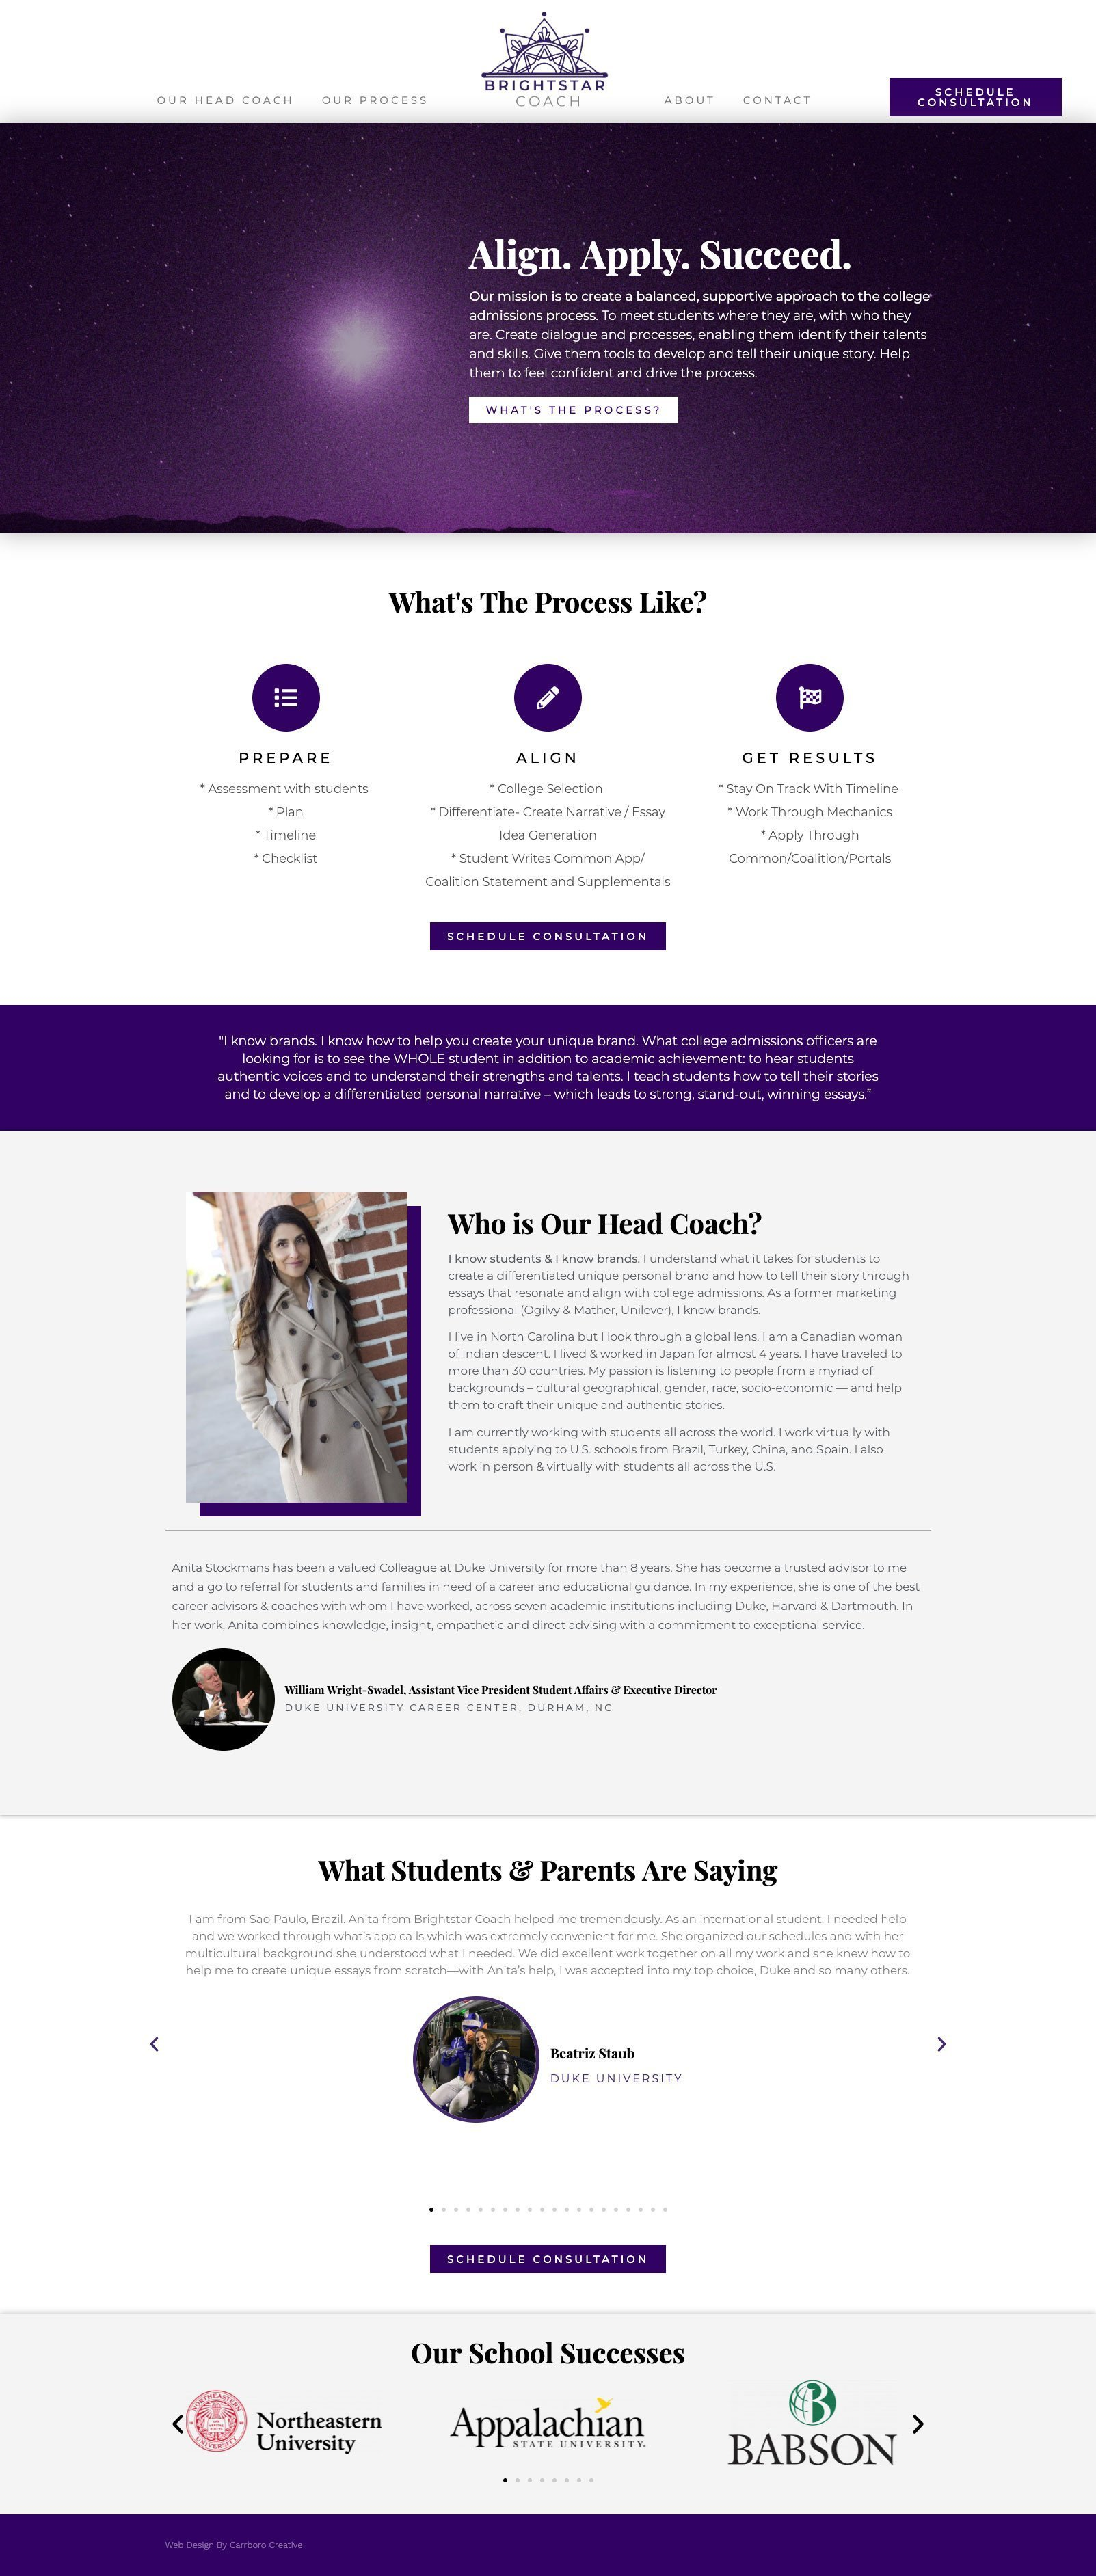 BrightStar Coach Website Screenshot